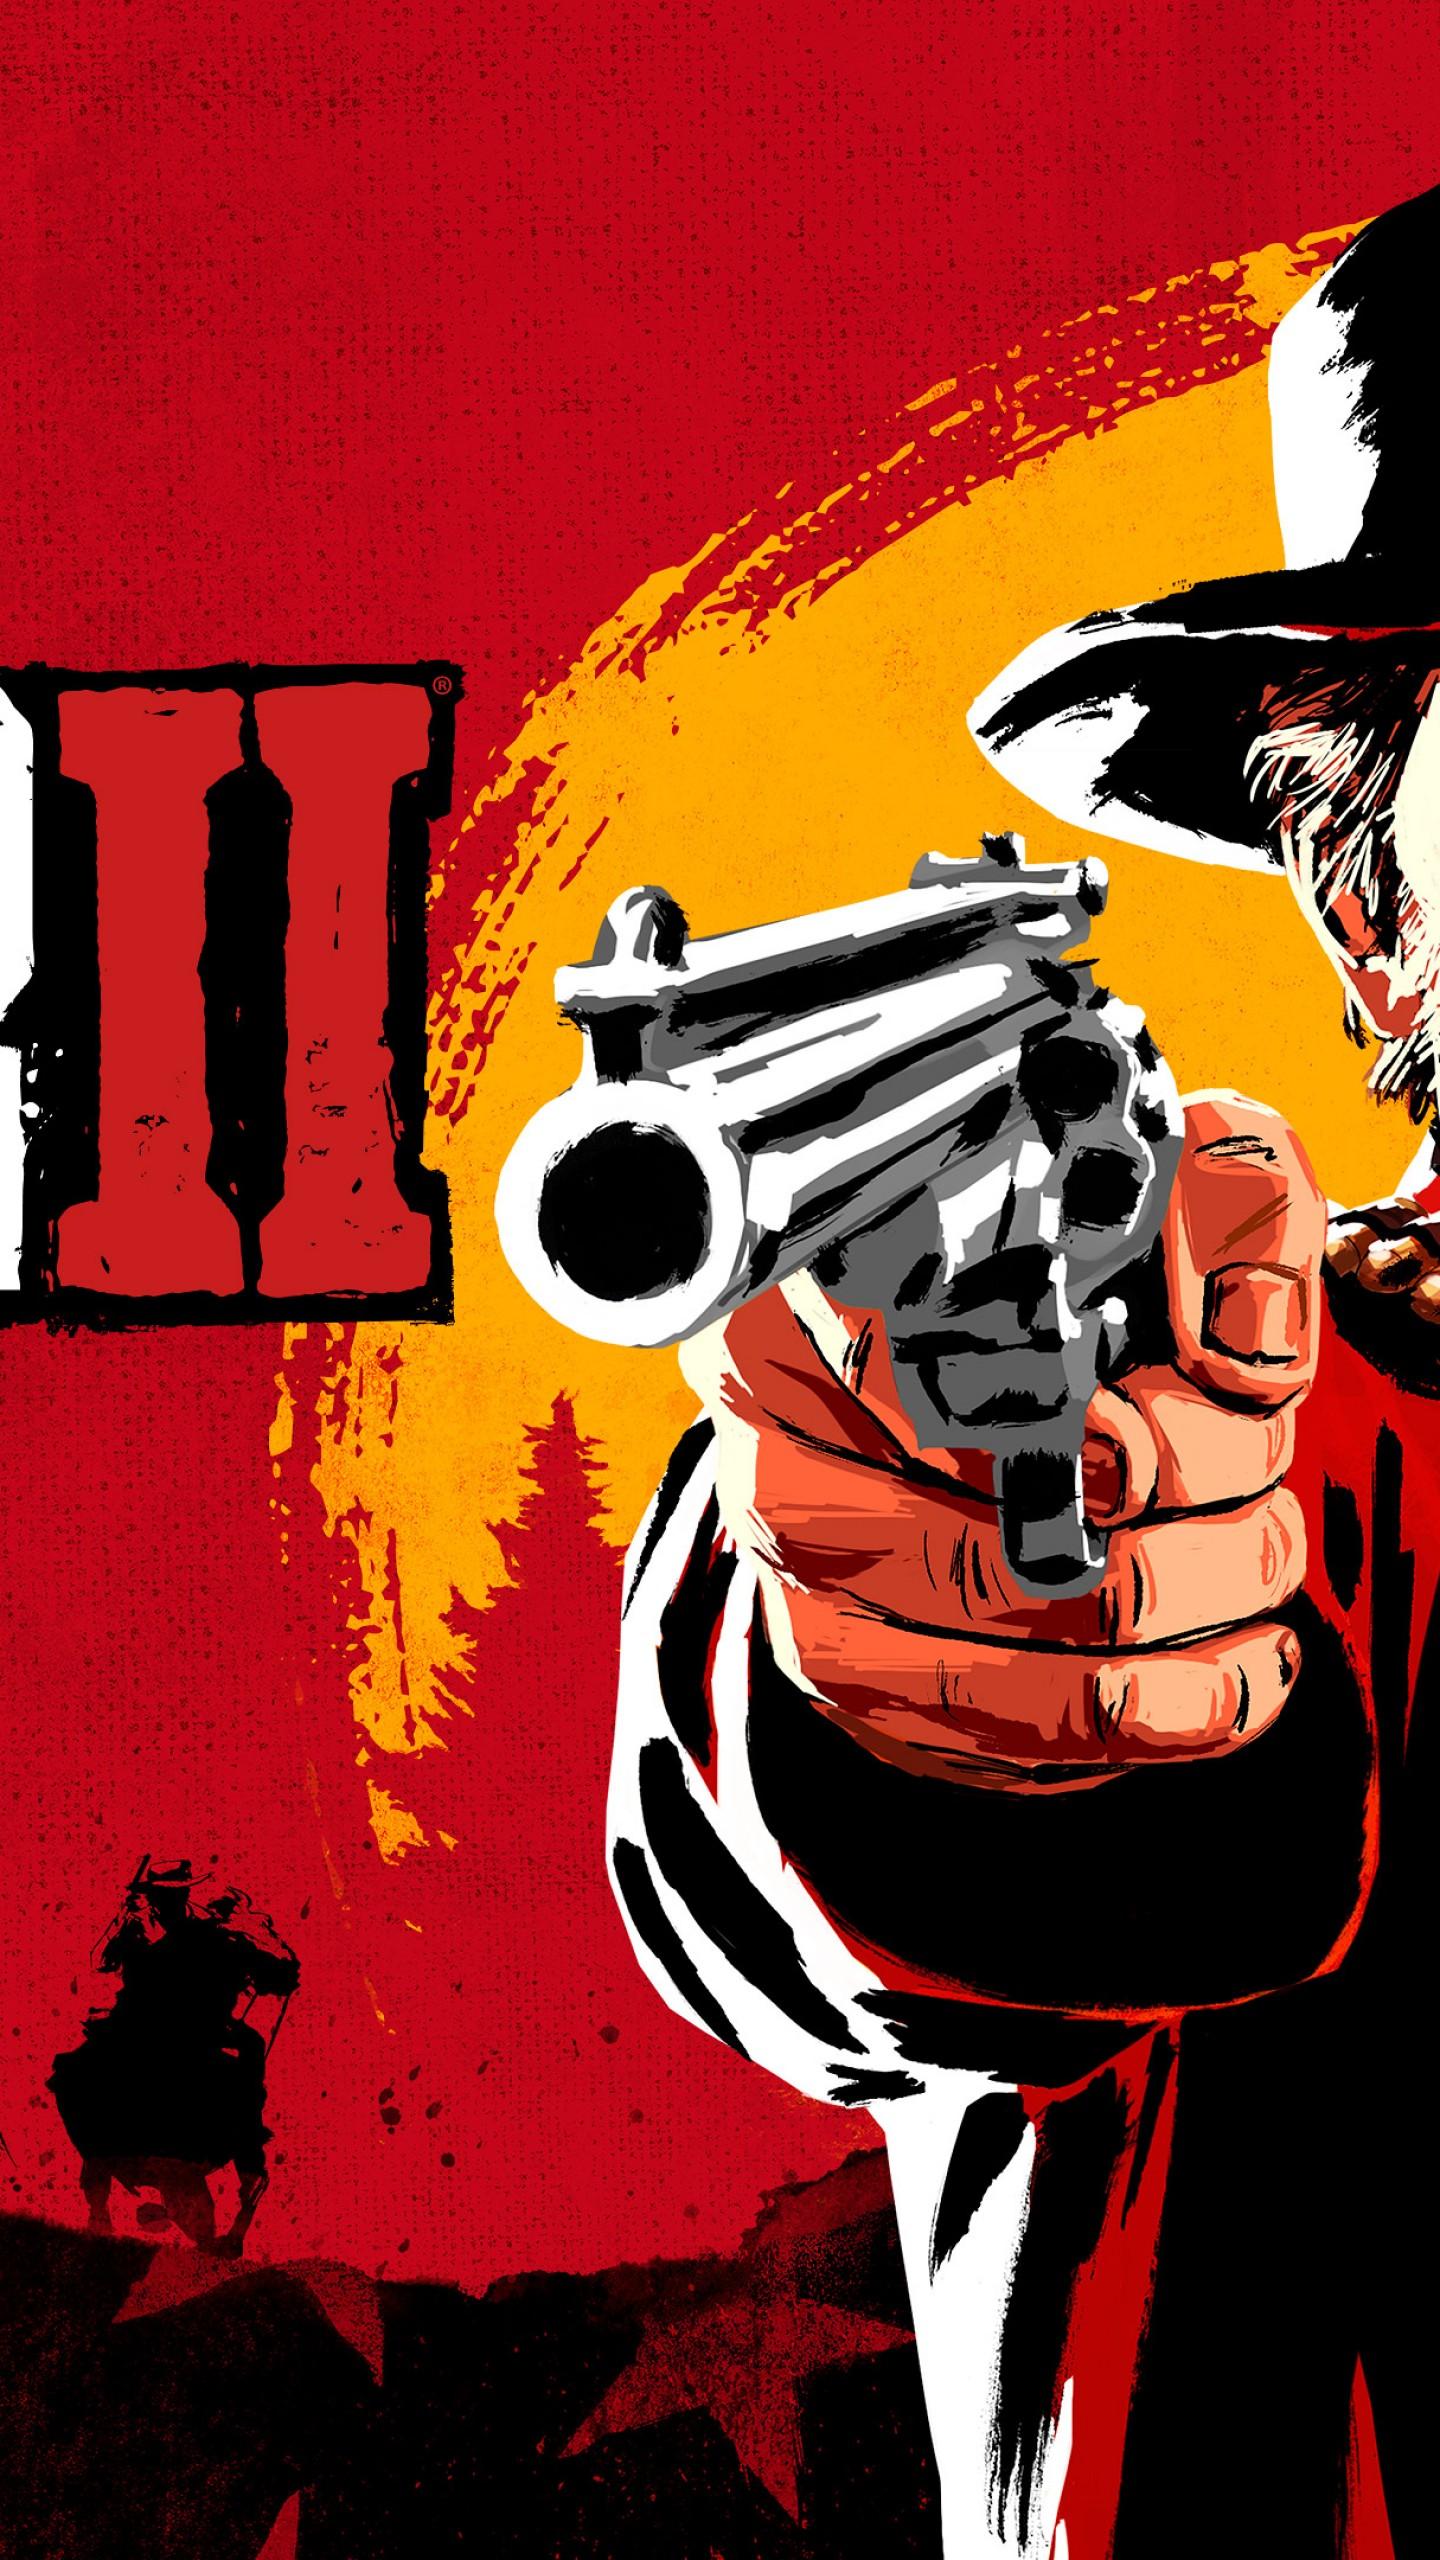 Wallpaper Red Dead Redemption 2 Poster 4k Games 18223